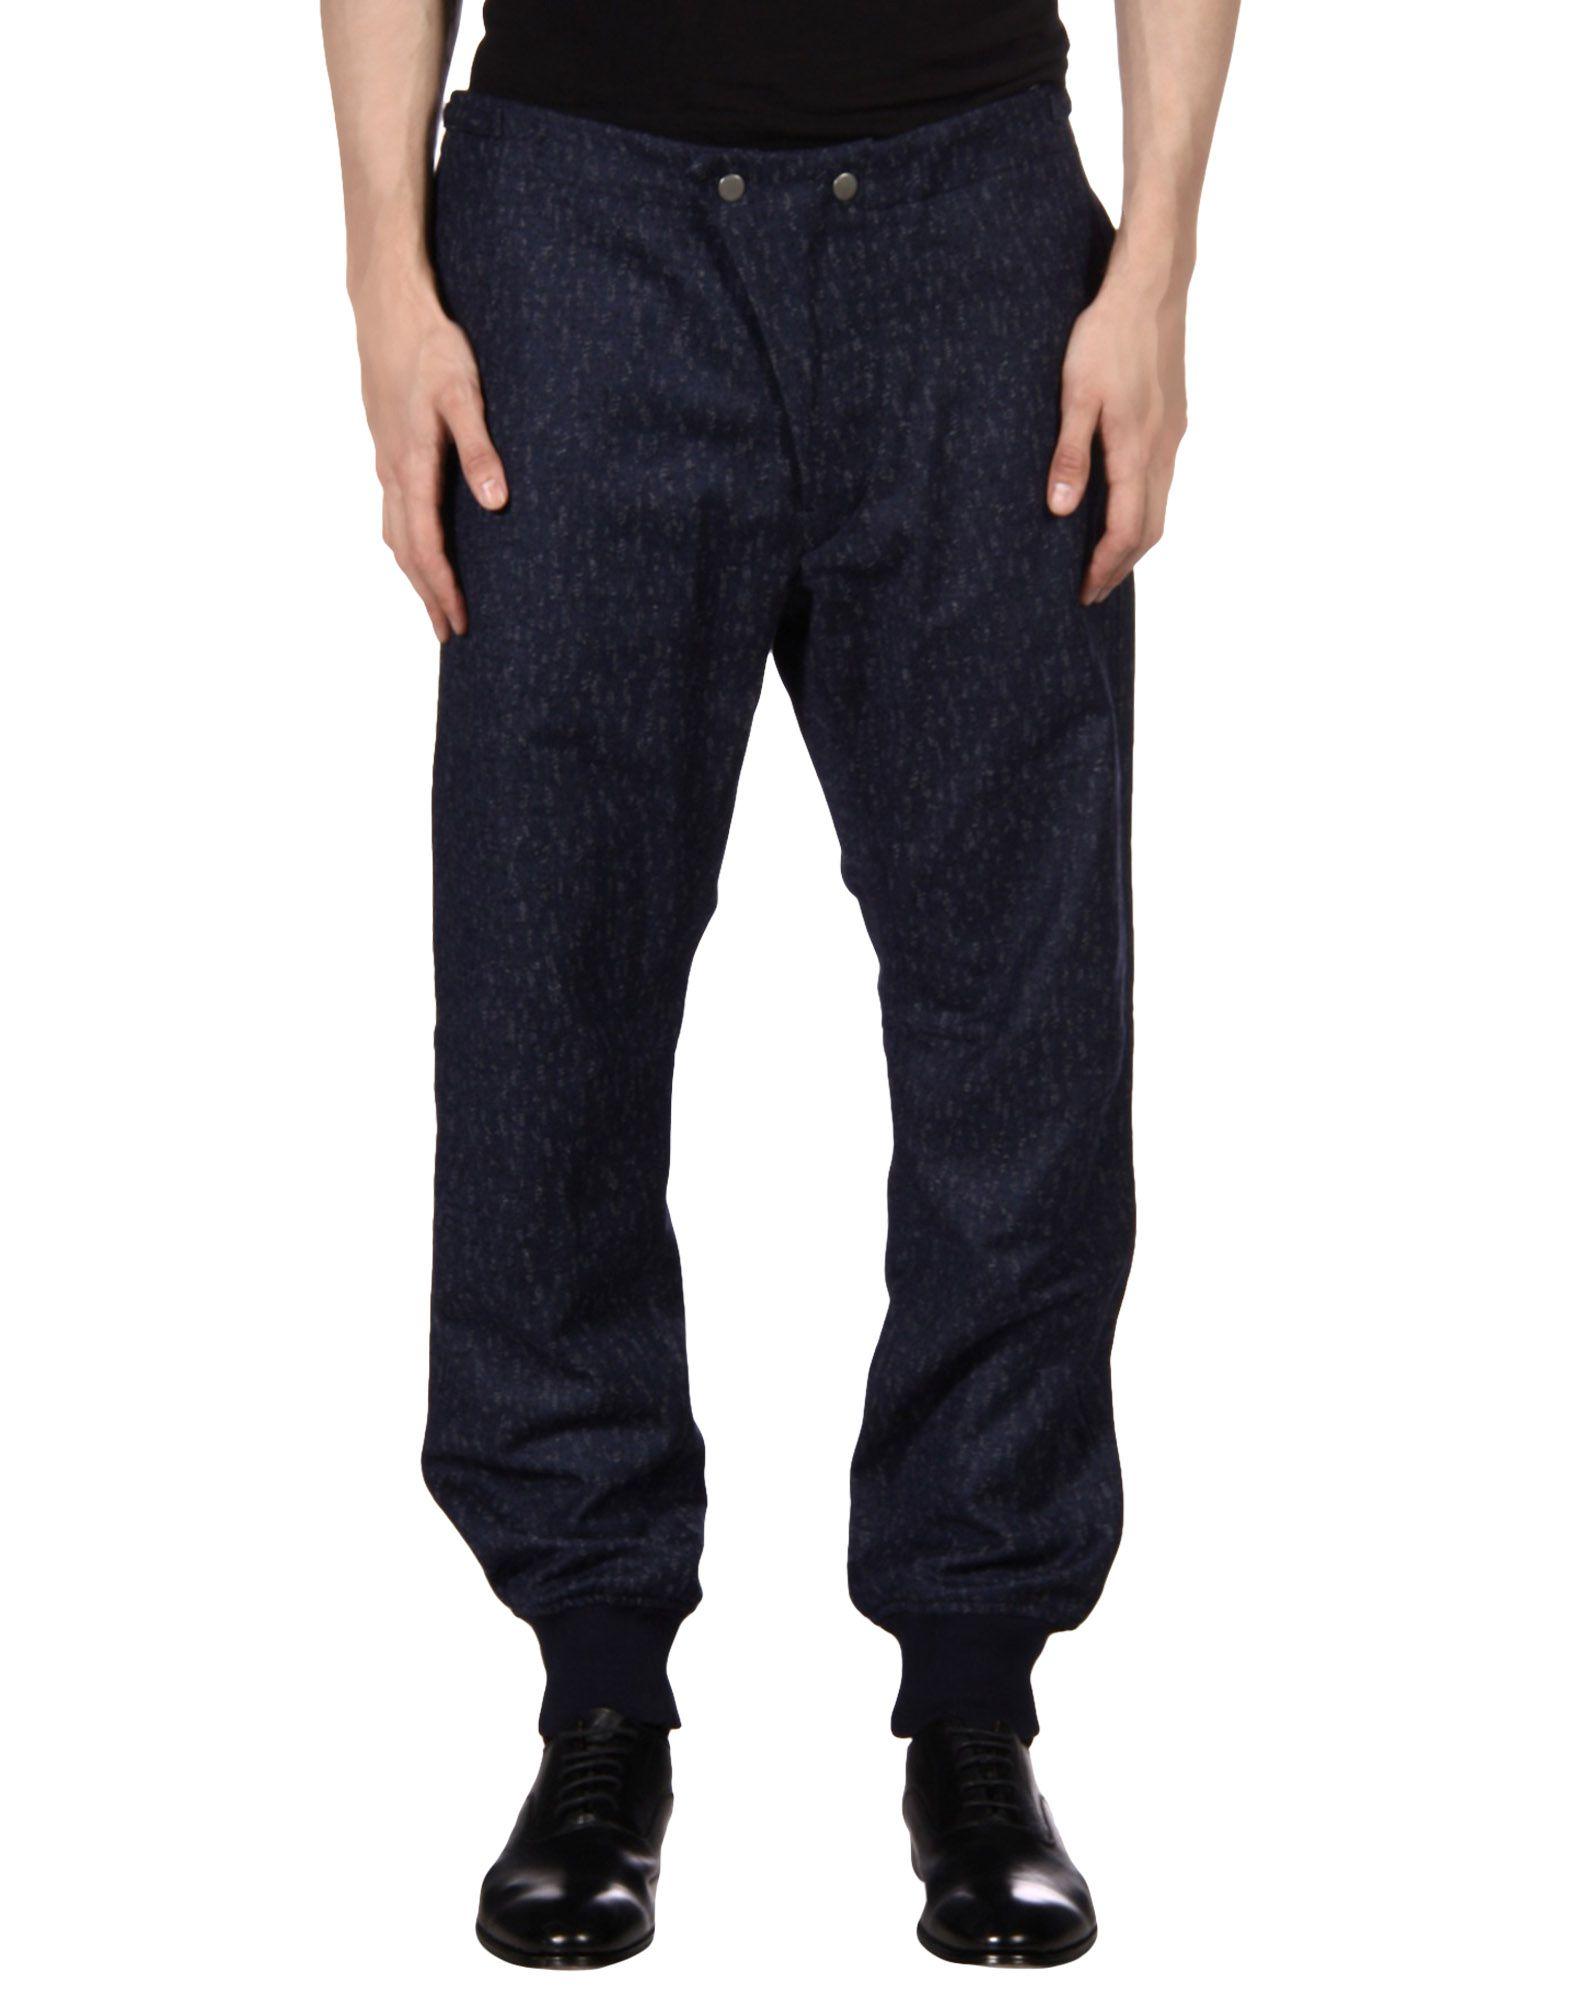 CADET Casual Pants in Dark Blue